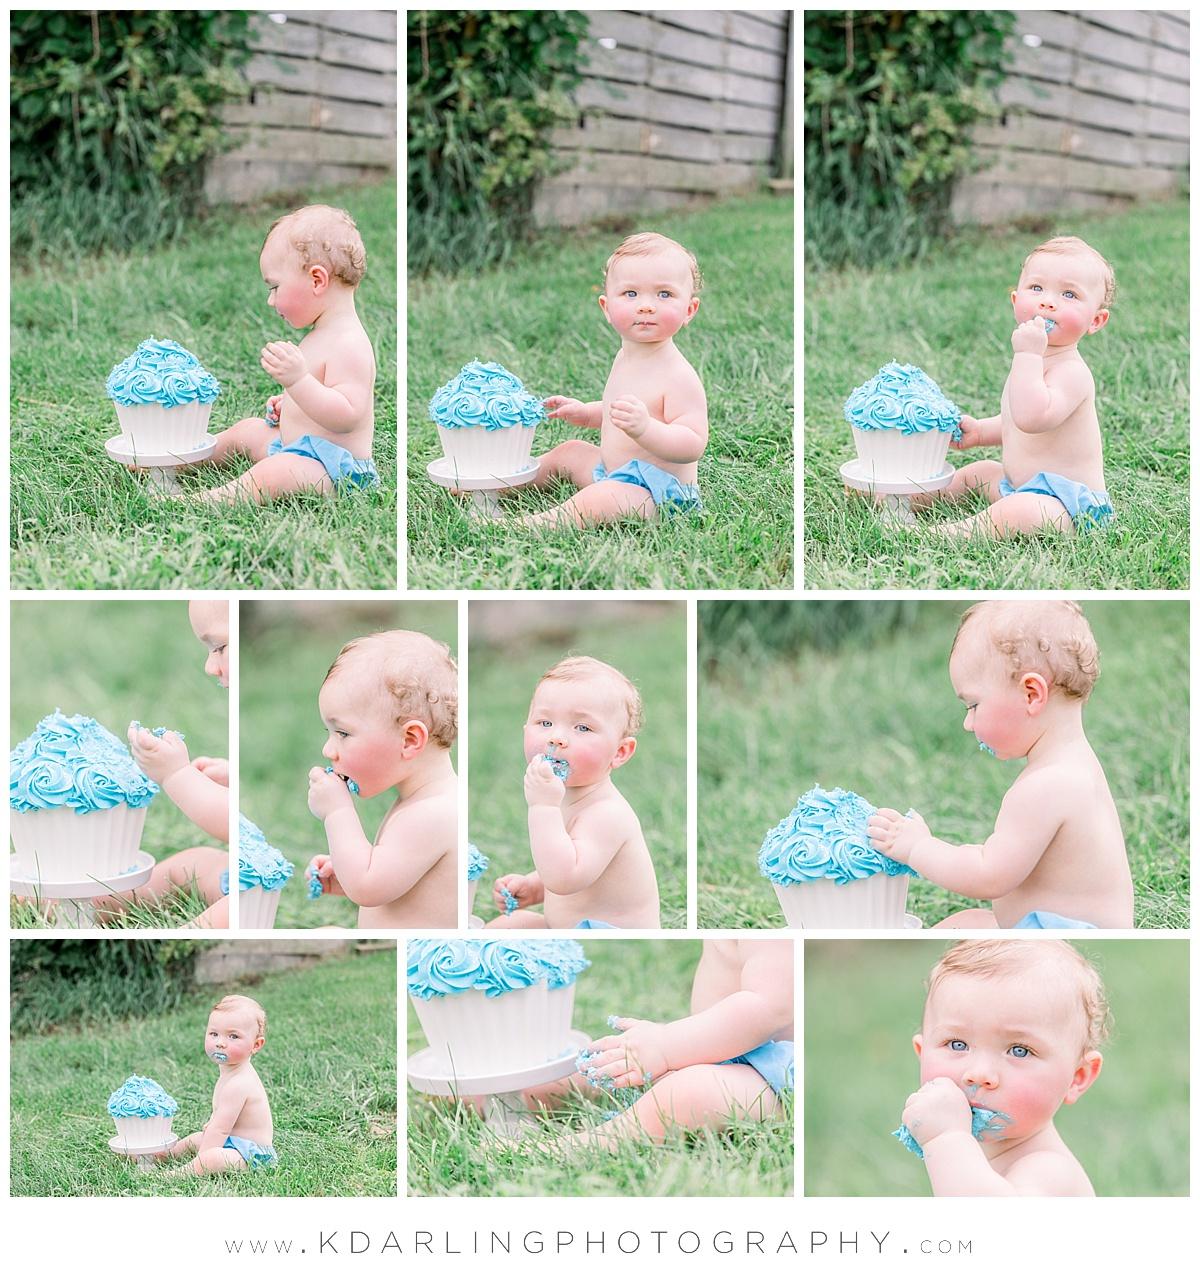 Central-Illinois-baby-child-photographer-first-birthday-boy-cake-smash_0471.jpg